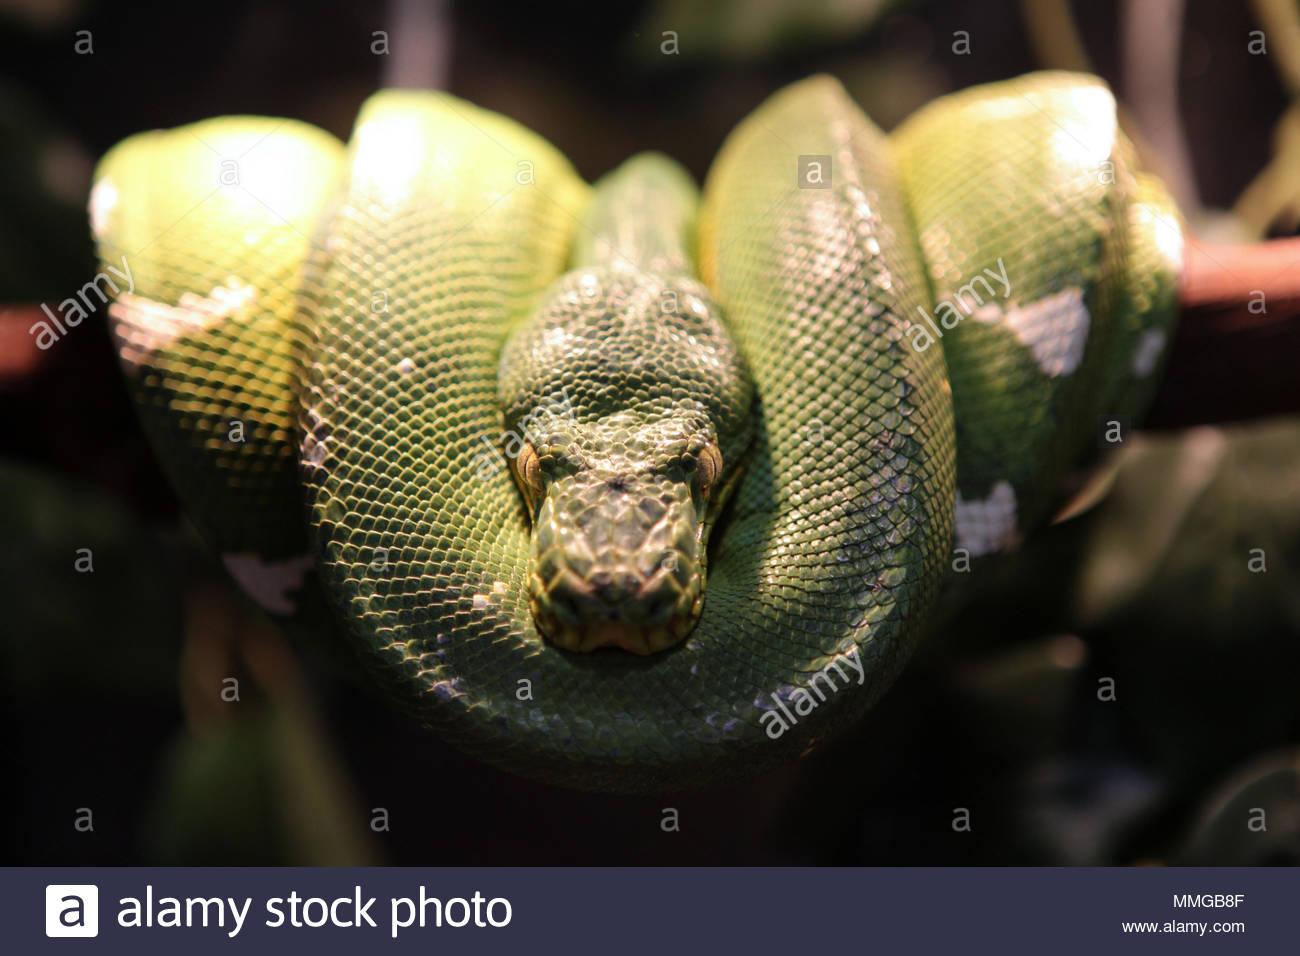 A female Emerald Tree Boa (Corallus caninus) at an exotic reptile